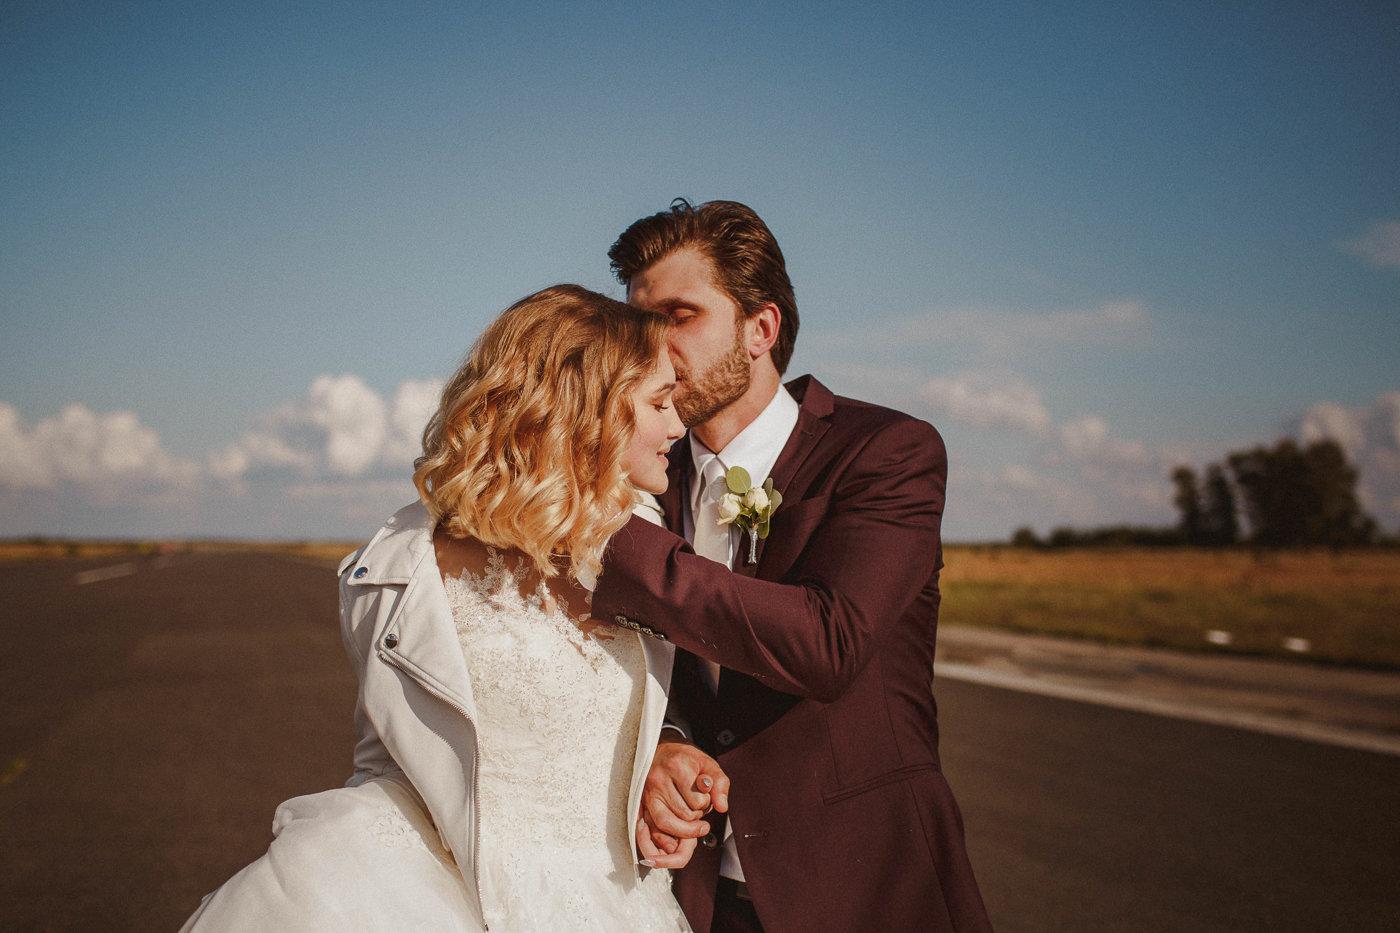 destination-wedding-photography-39.jpg